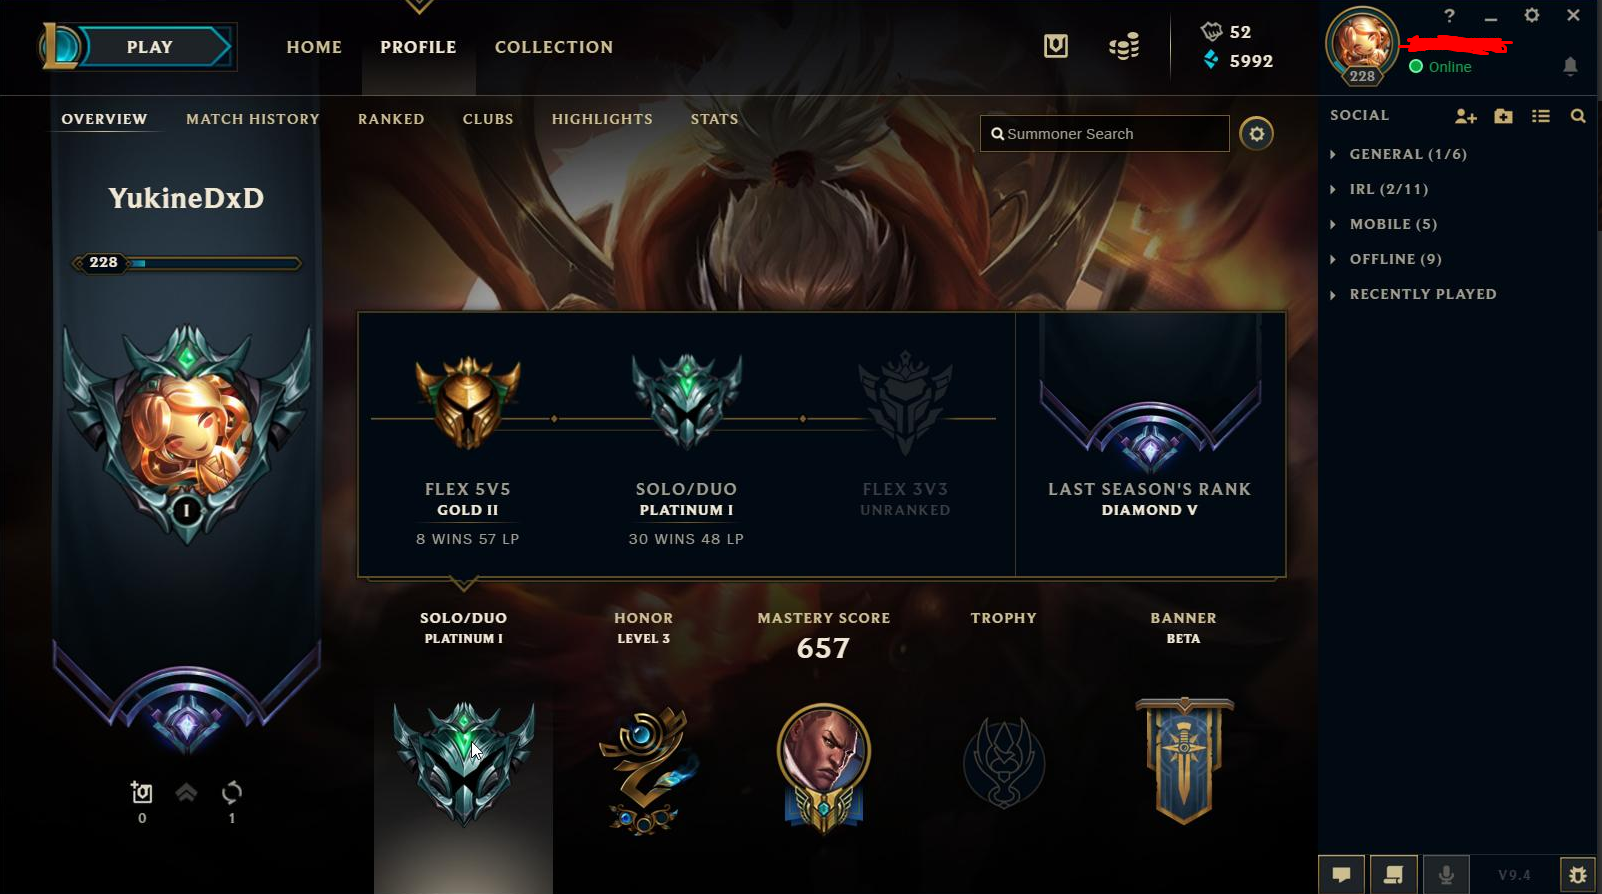 Diamond IV account